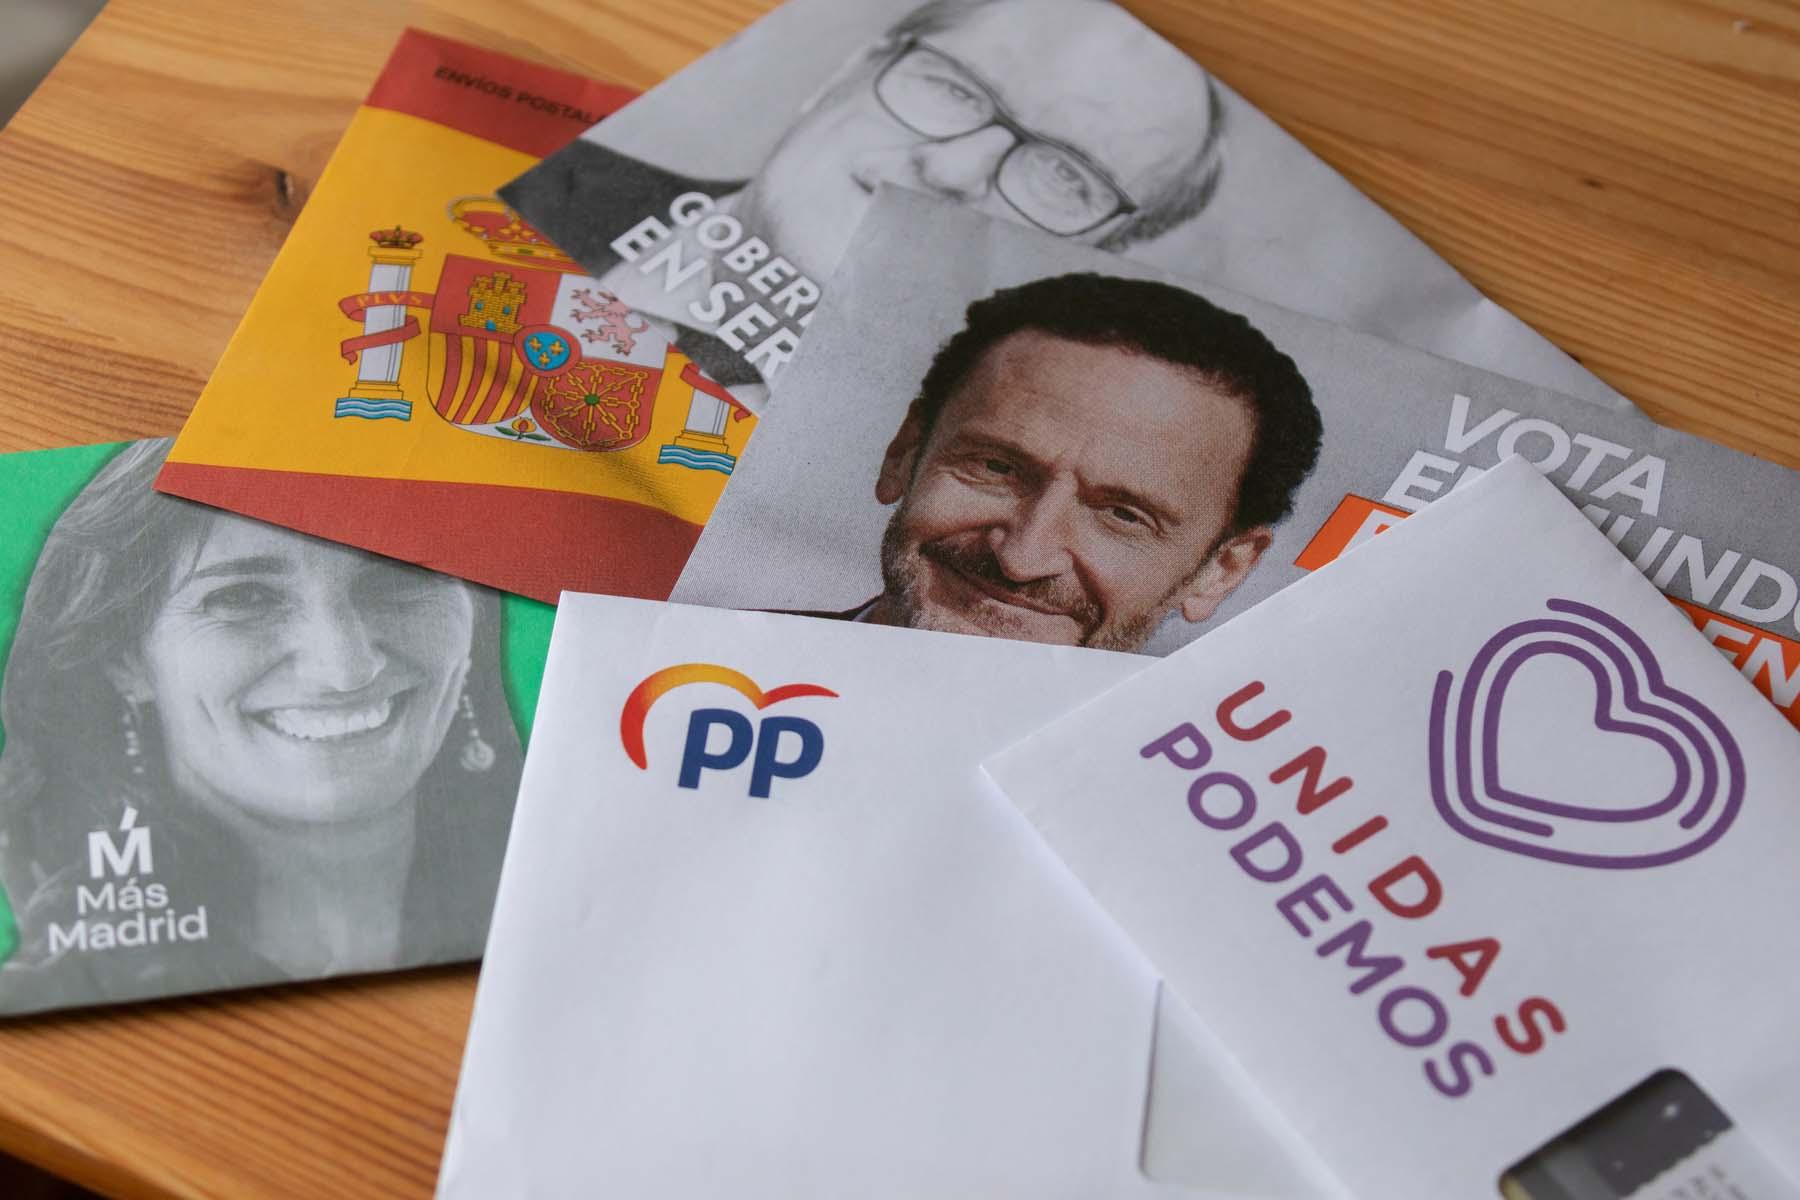 Regional elections in Spain